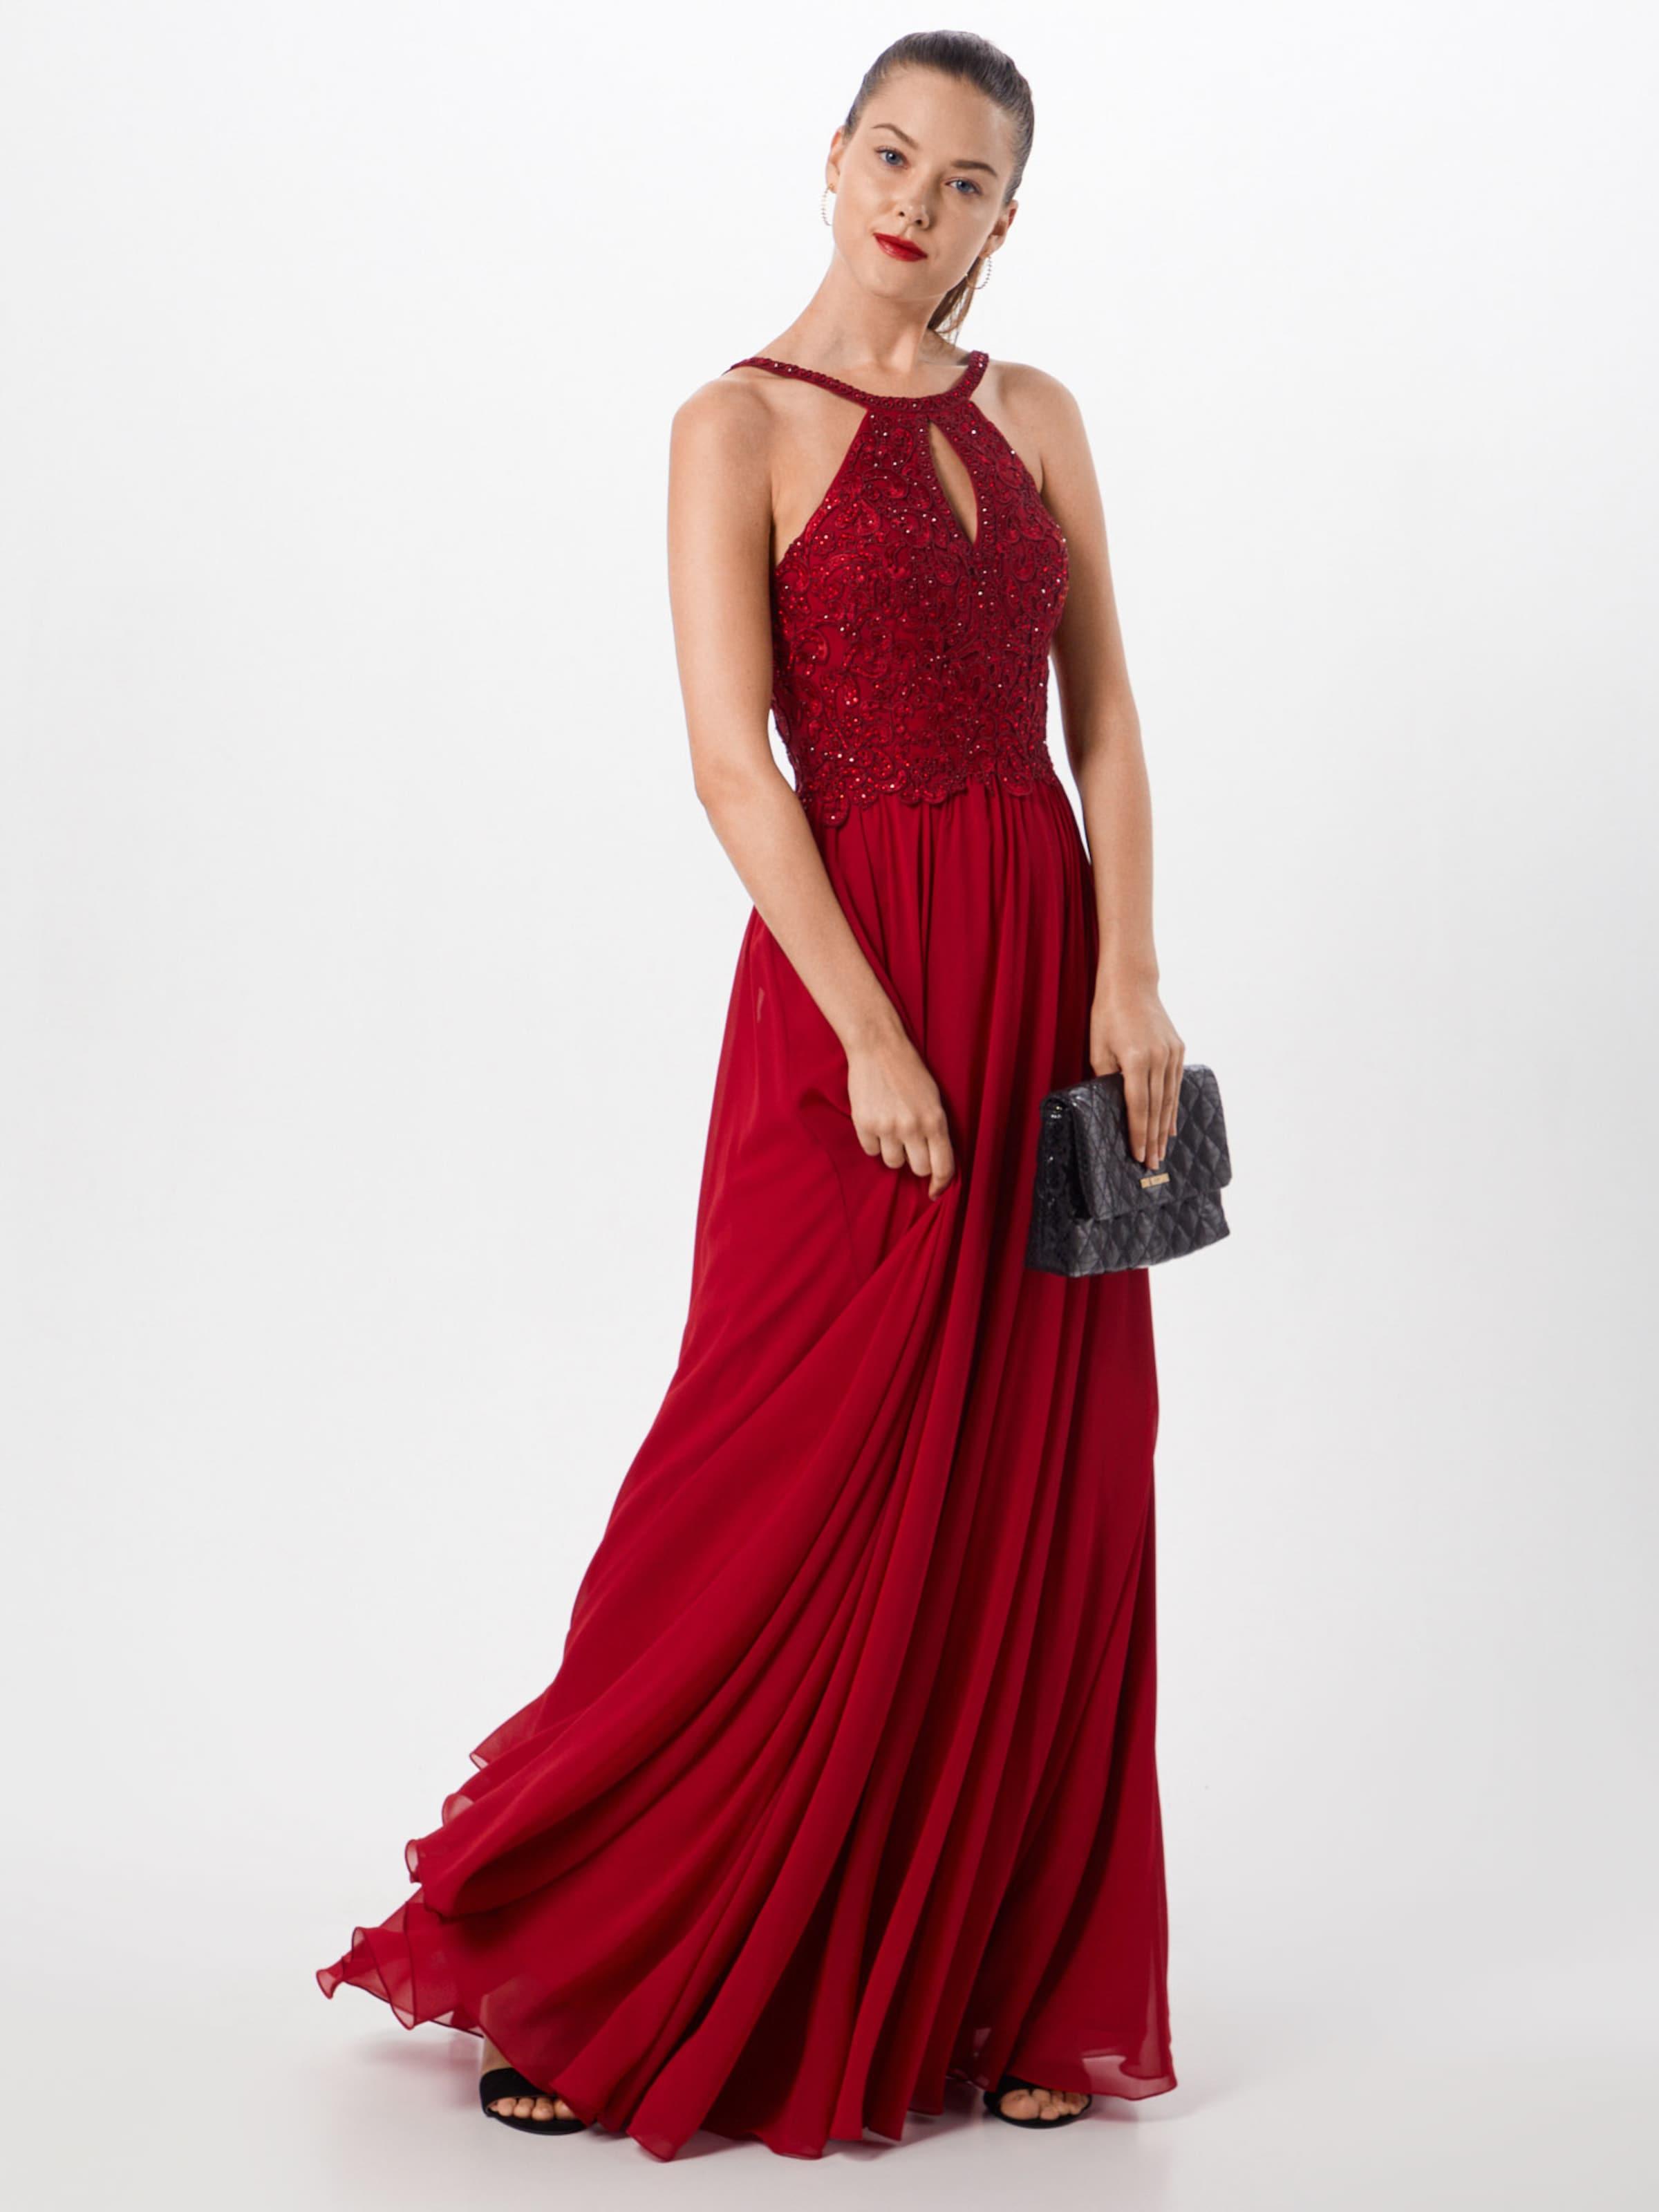 Luxuar In Abendkleid Kirschrot Abendkleid Luxuar Abendkleid In Kirschrot In Luxuar fgYb6Iyv7